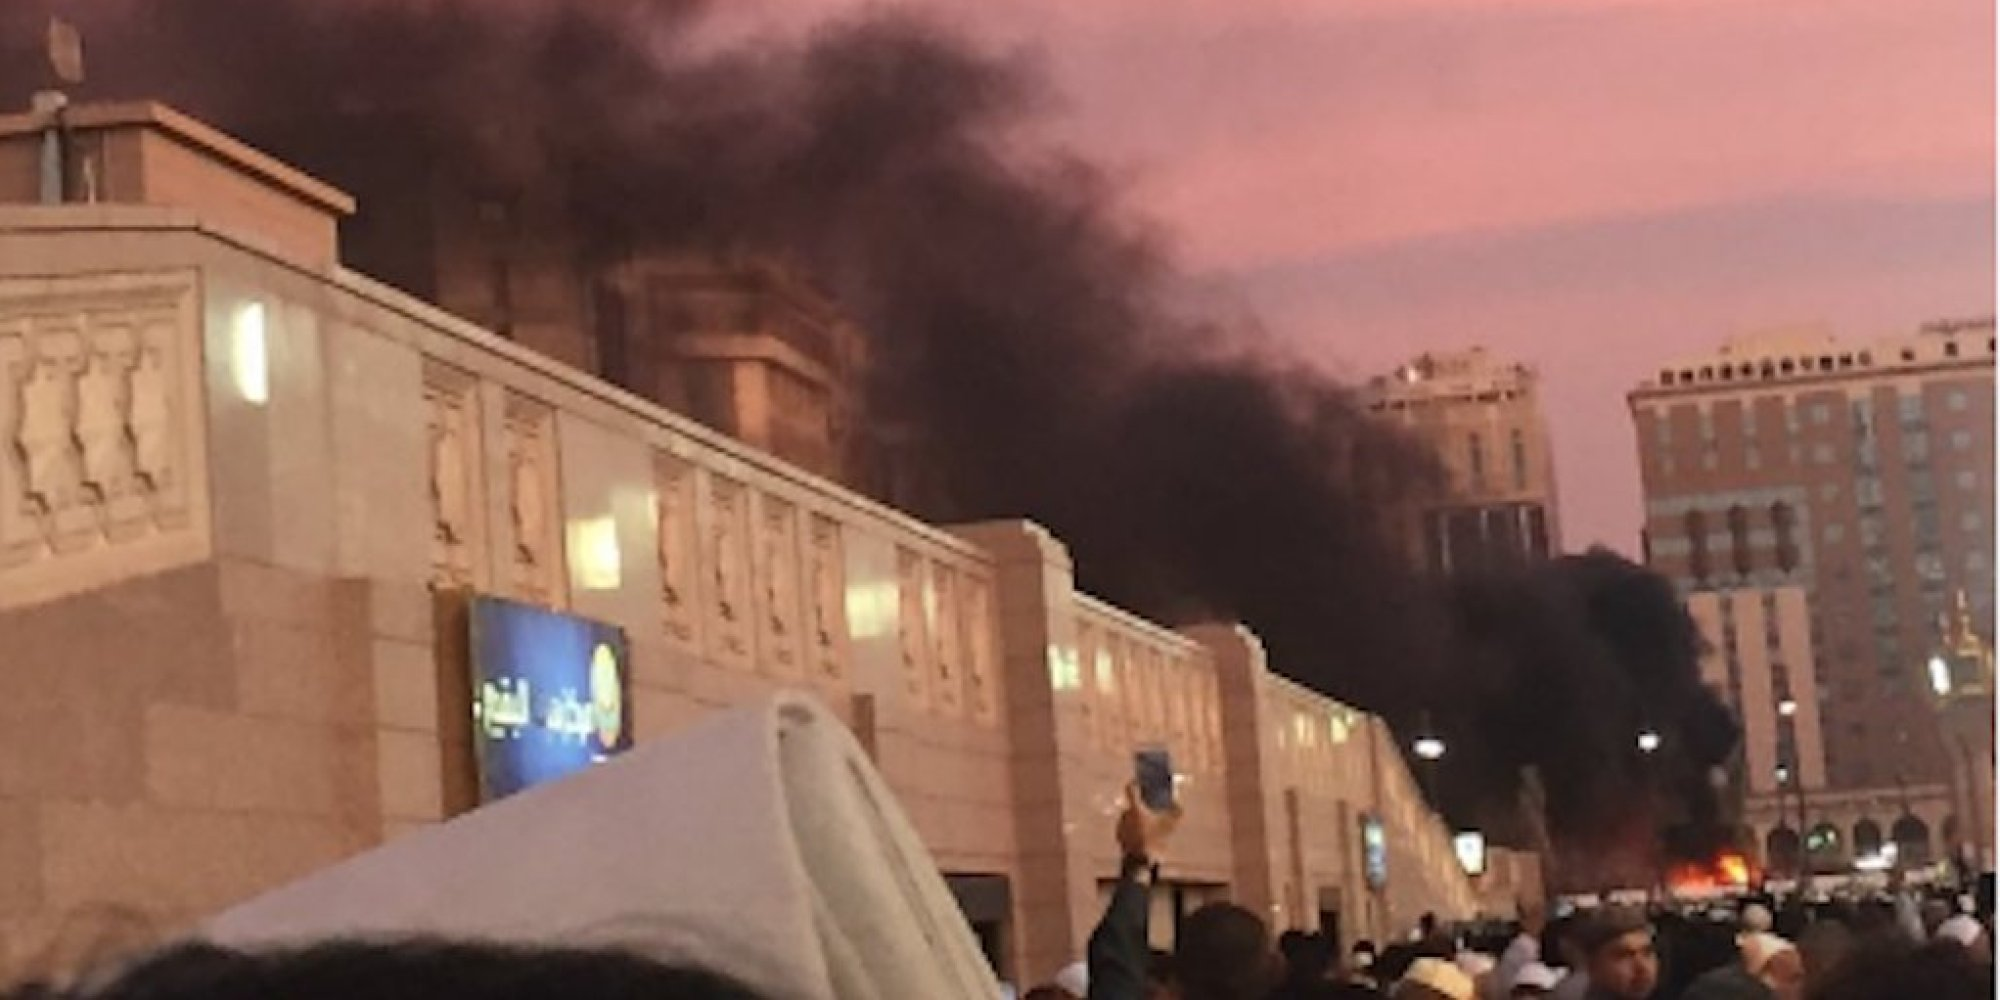 Arabie saoudite : 4 policiers tués dans un attentat-suicide à Médine